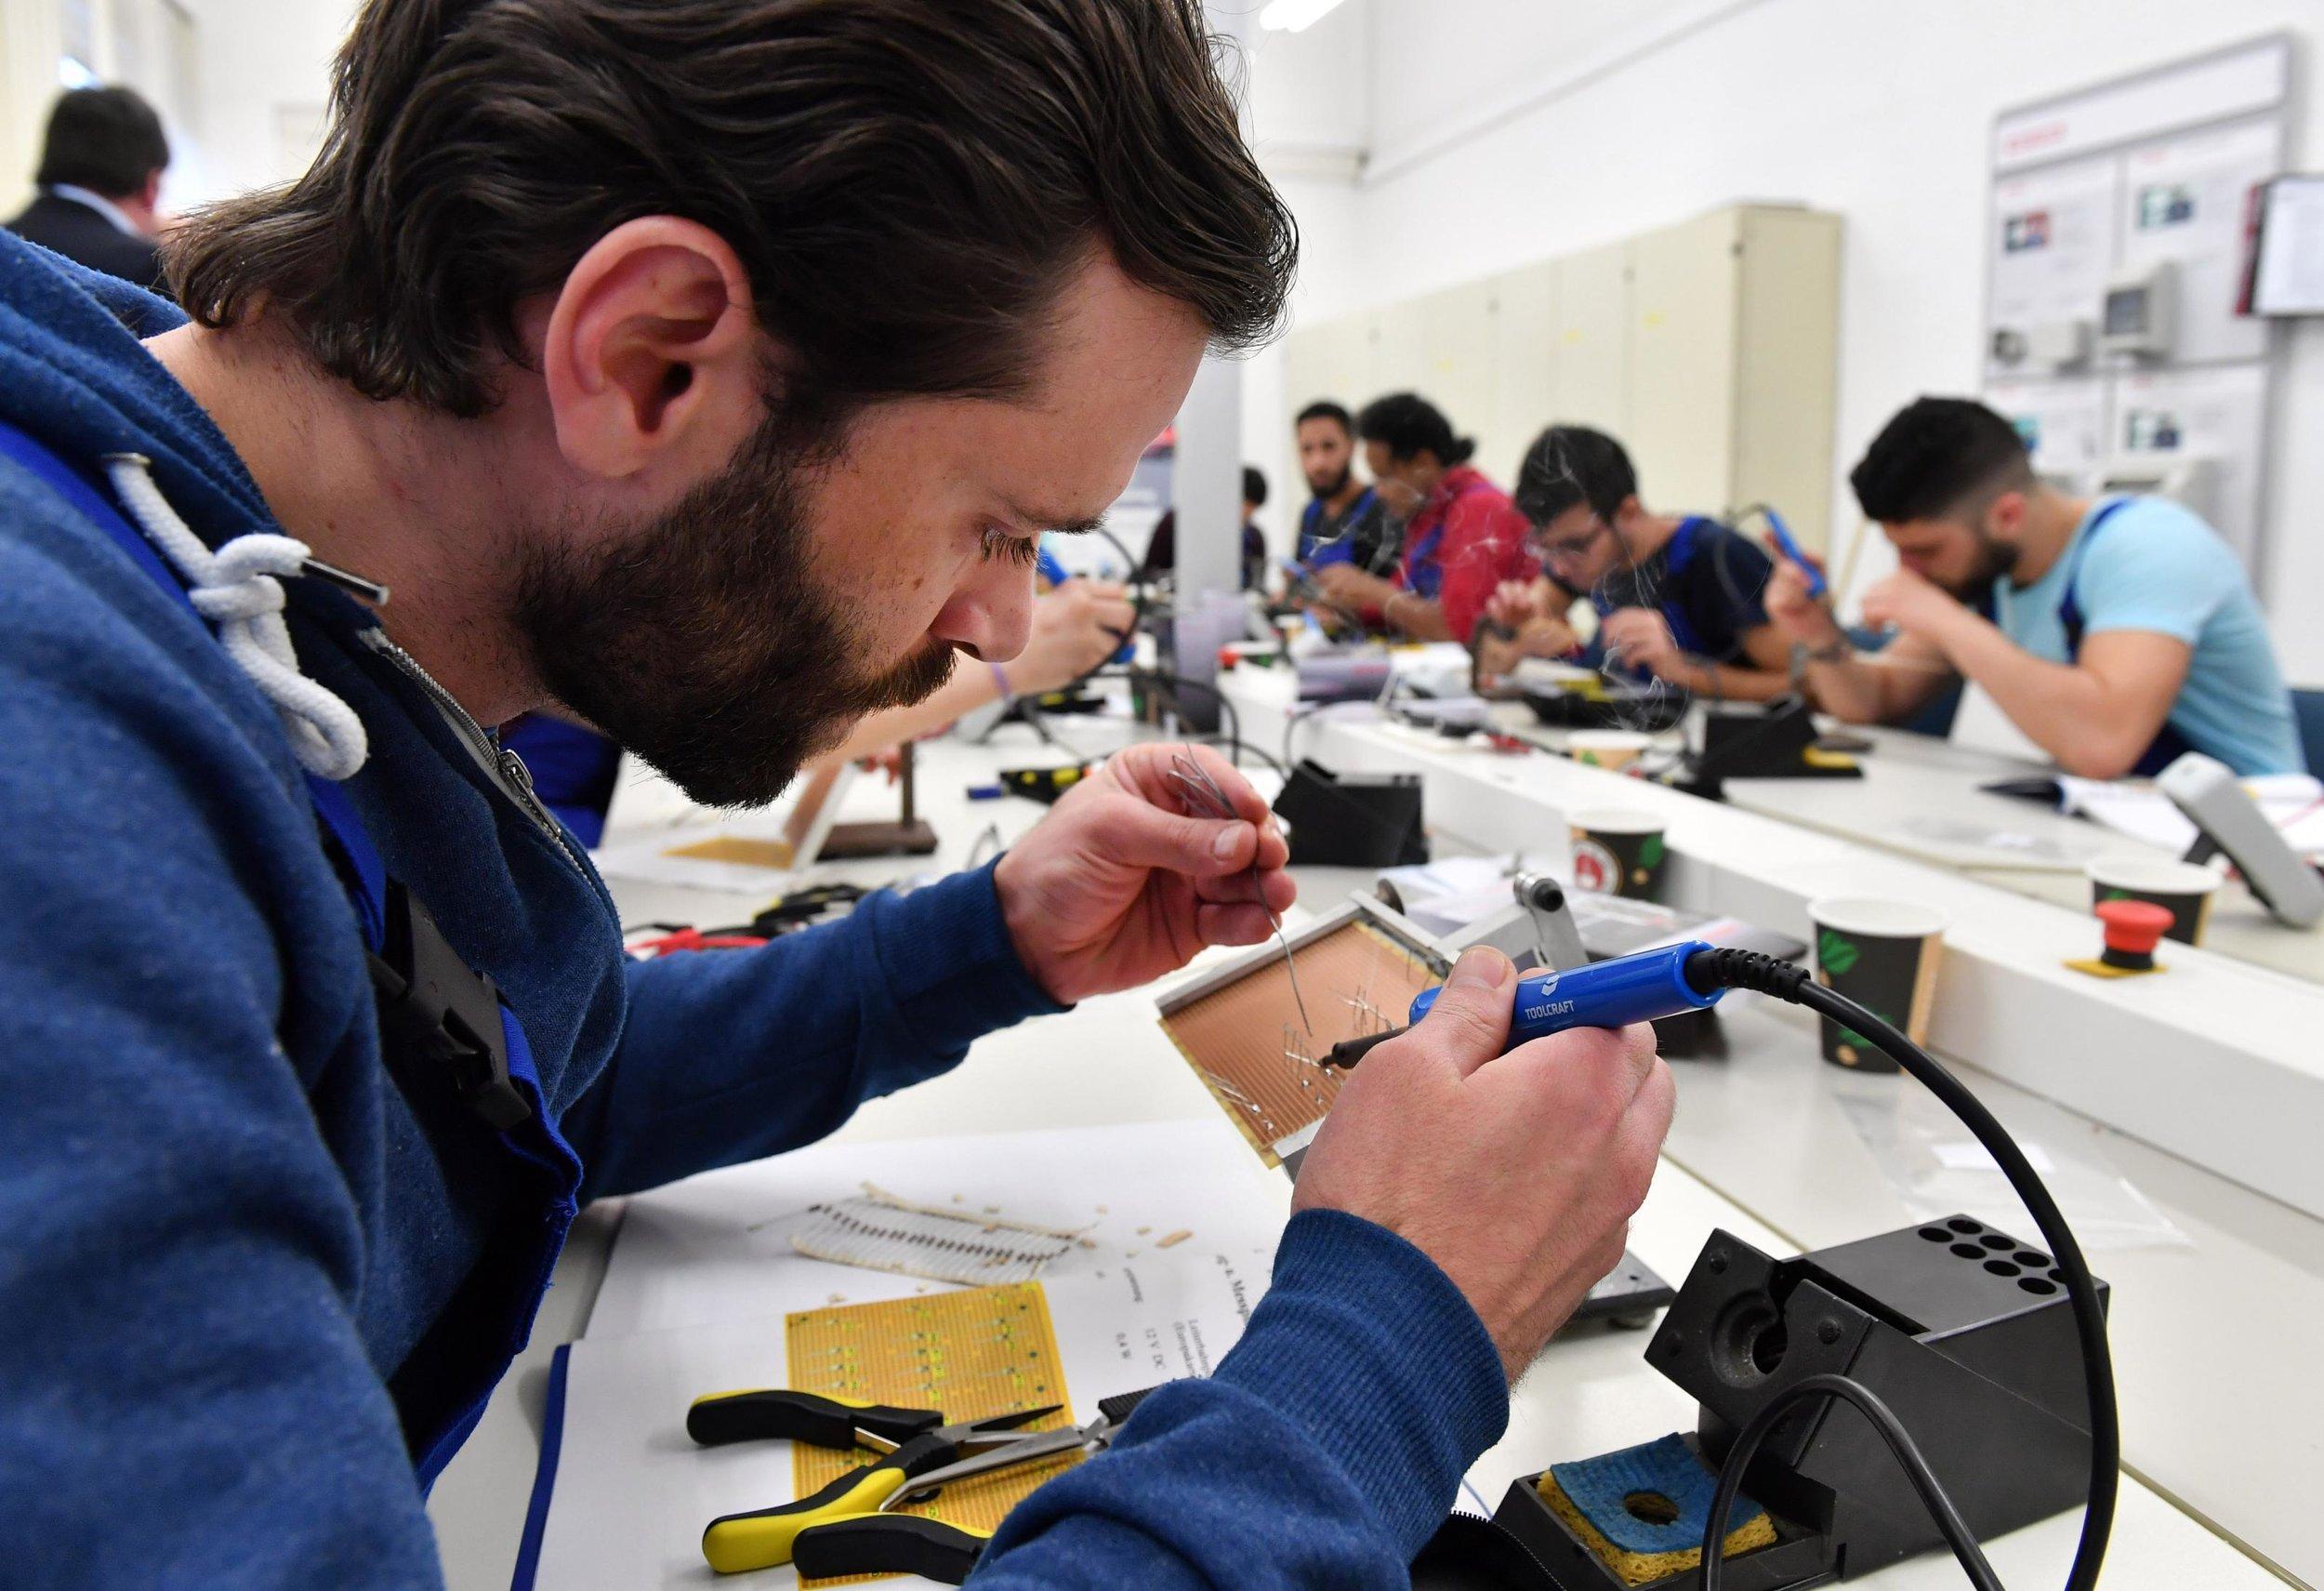 A Syrian refugee at a German Railway training workshop. Image credit:  Quartz